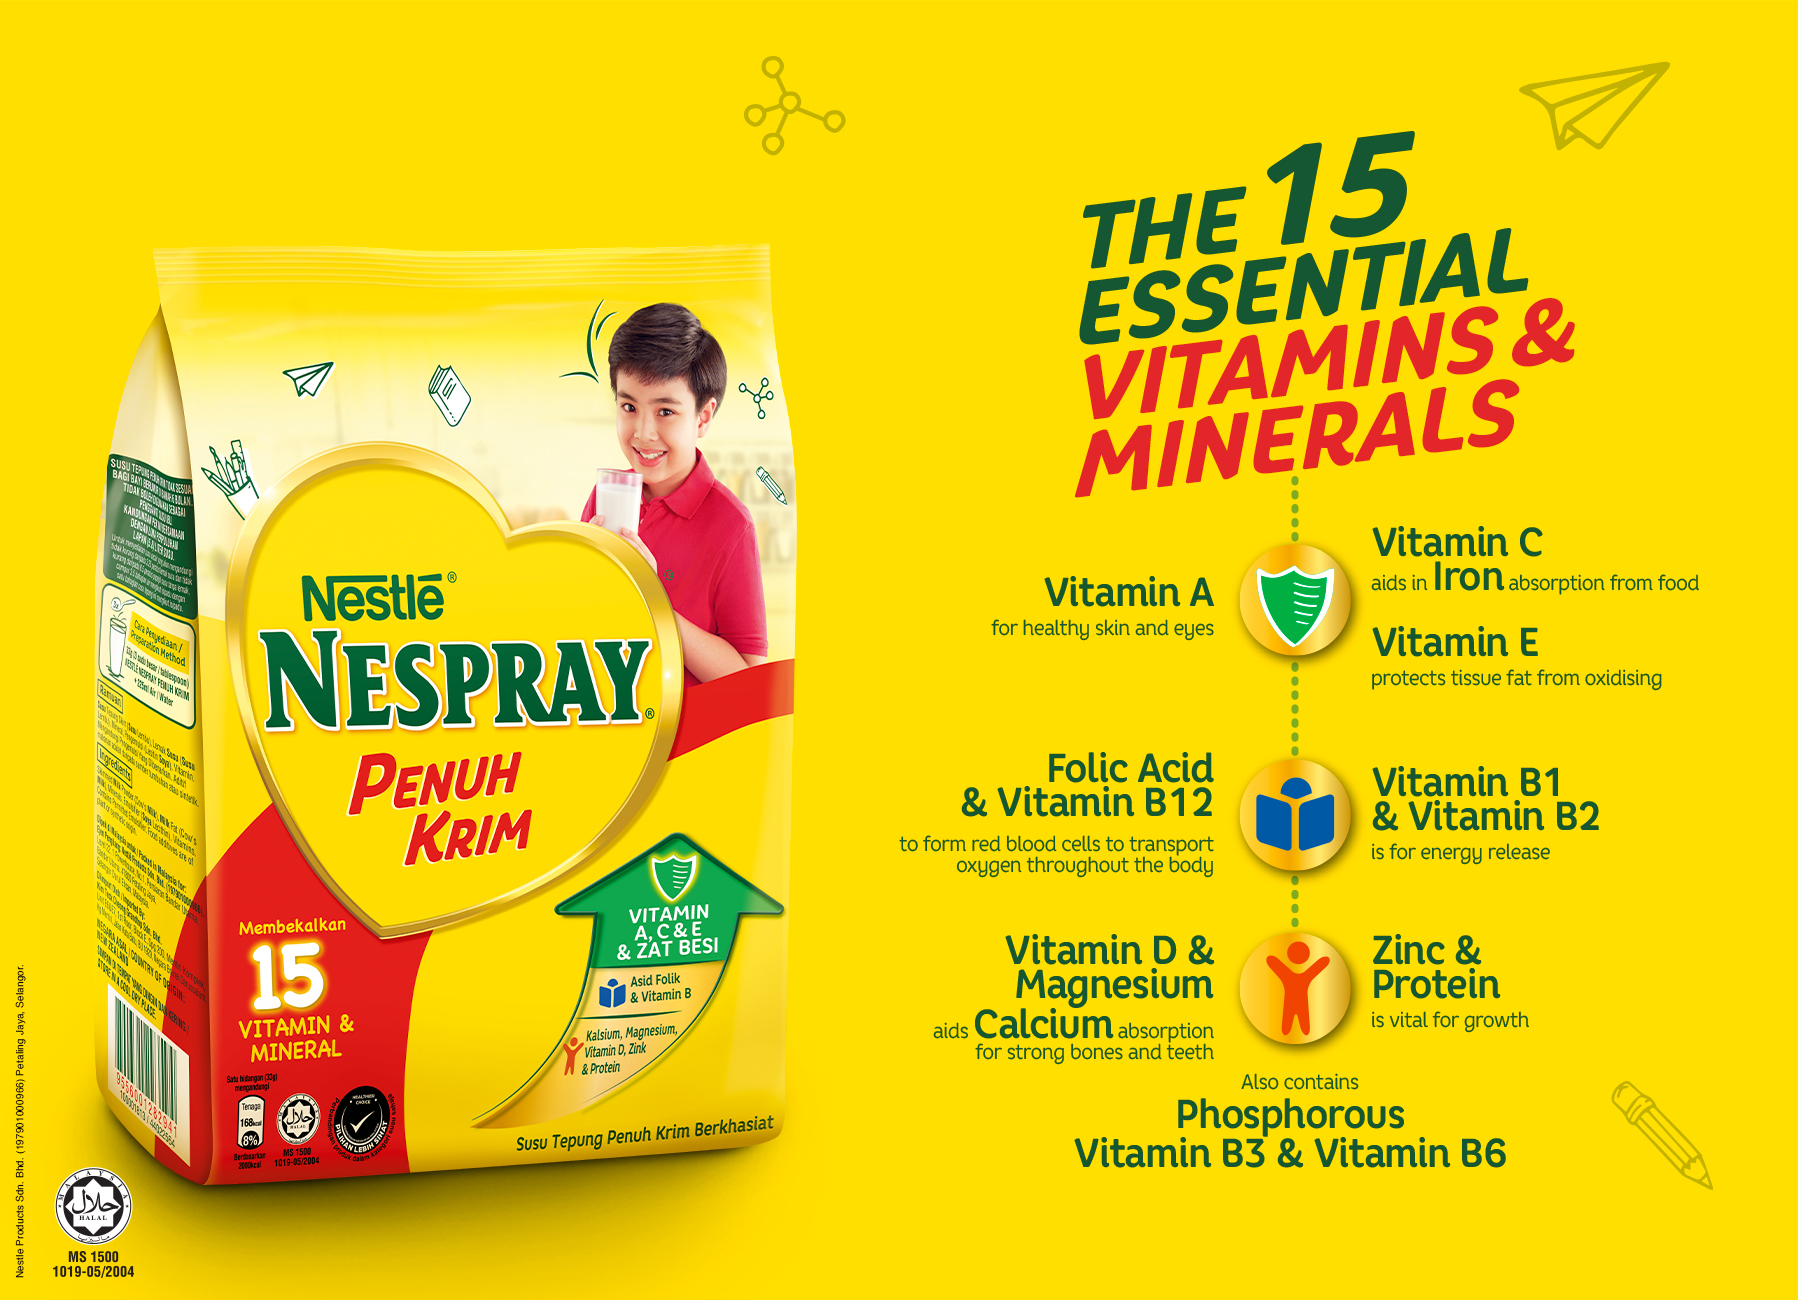 The 15 Essential Vitamins & Minerals